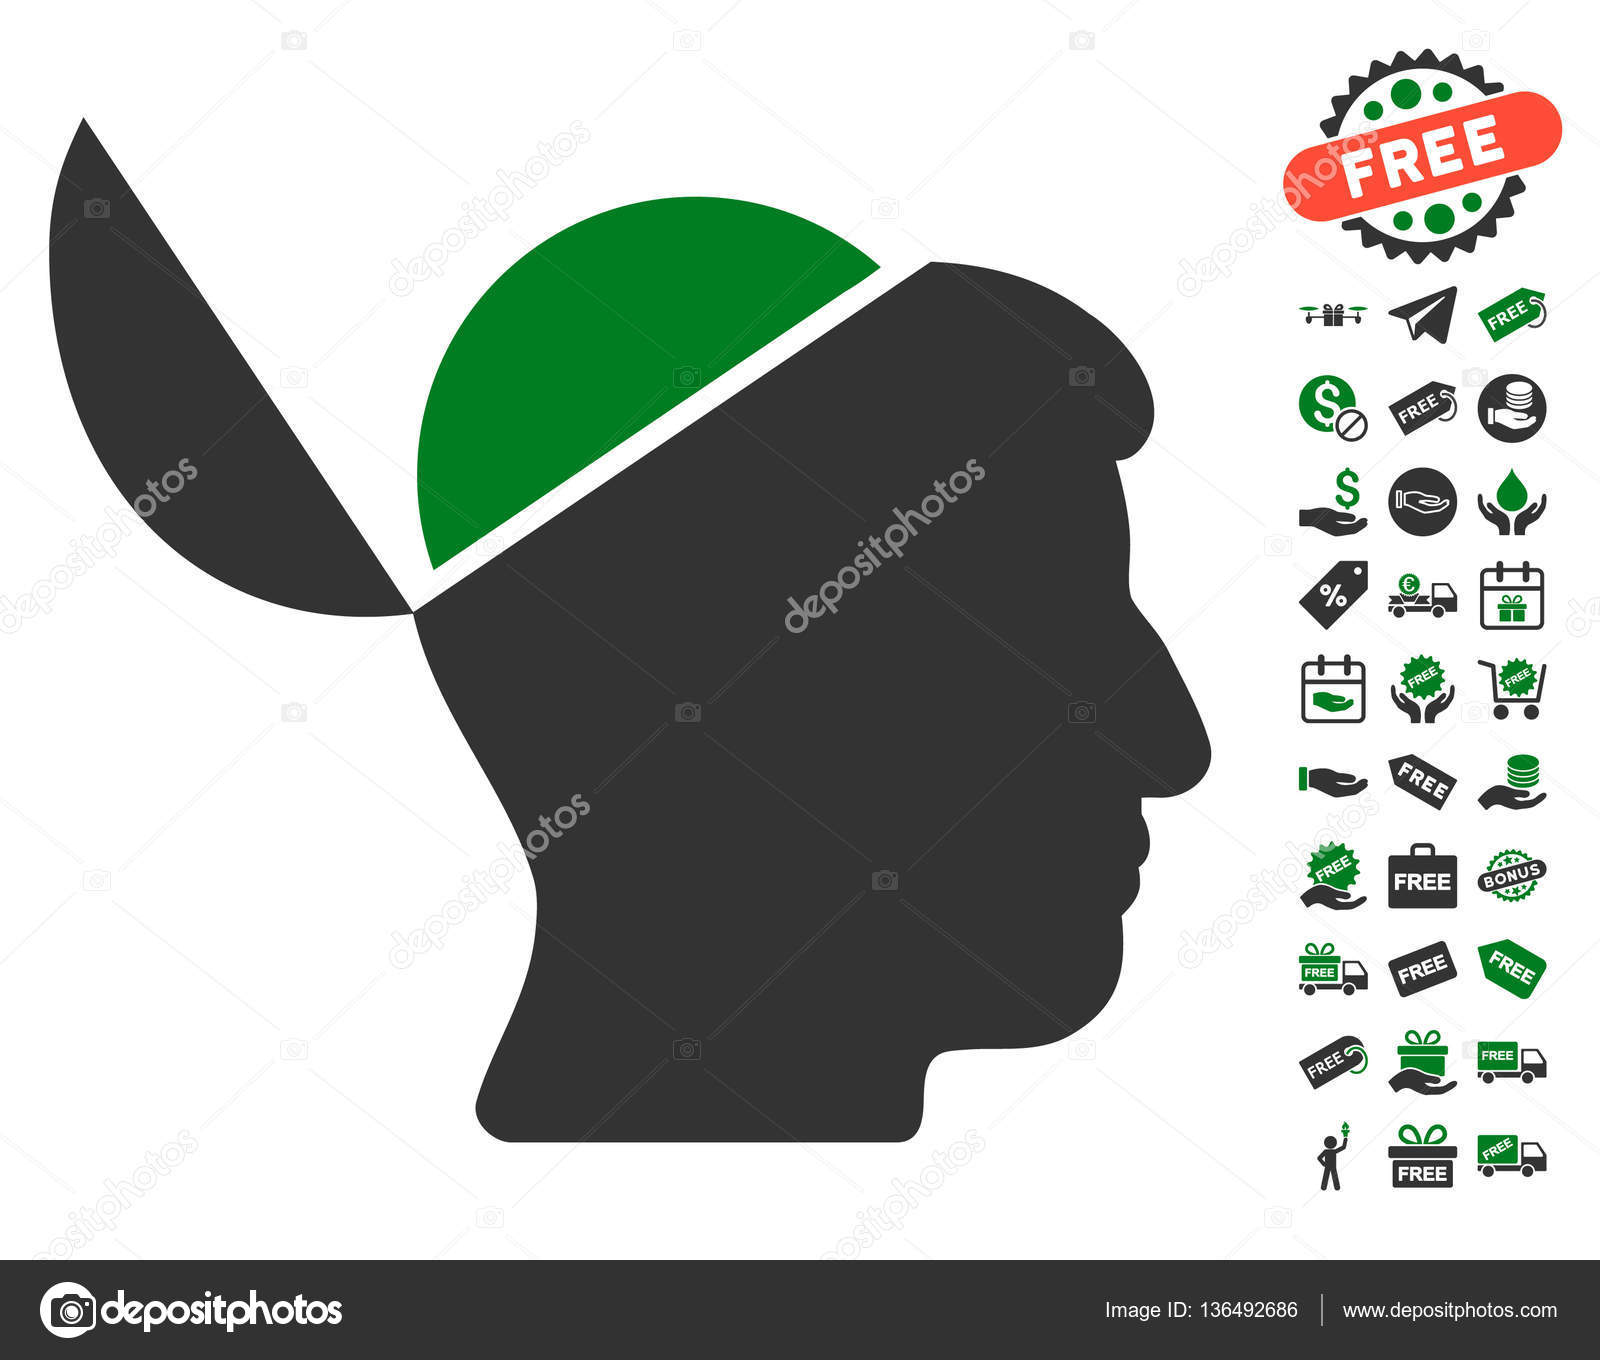 Open brain icon with free bonus stock vector ahasoft 136492686 open brain icon with free bonus stock vector biocorpaavc Images